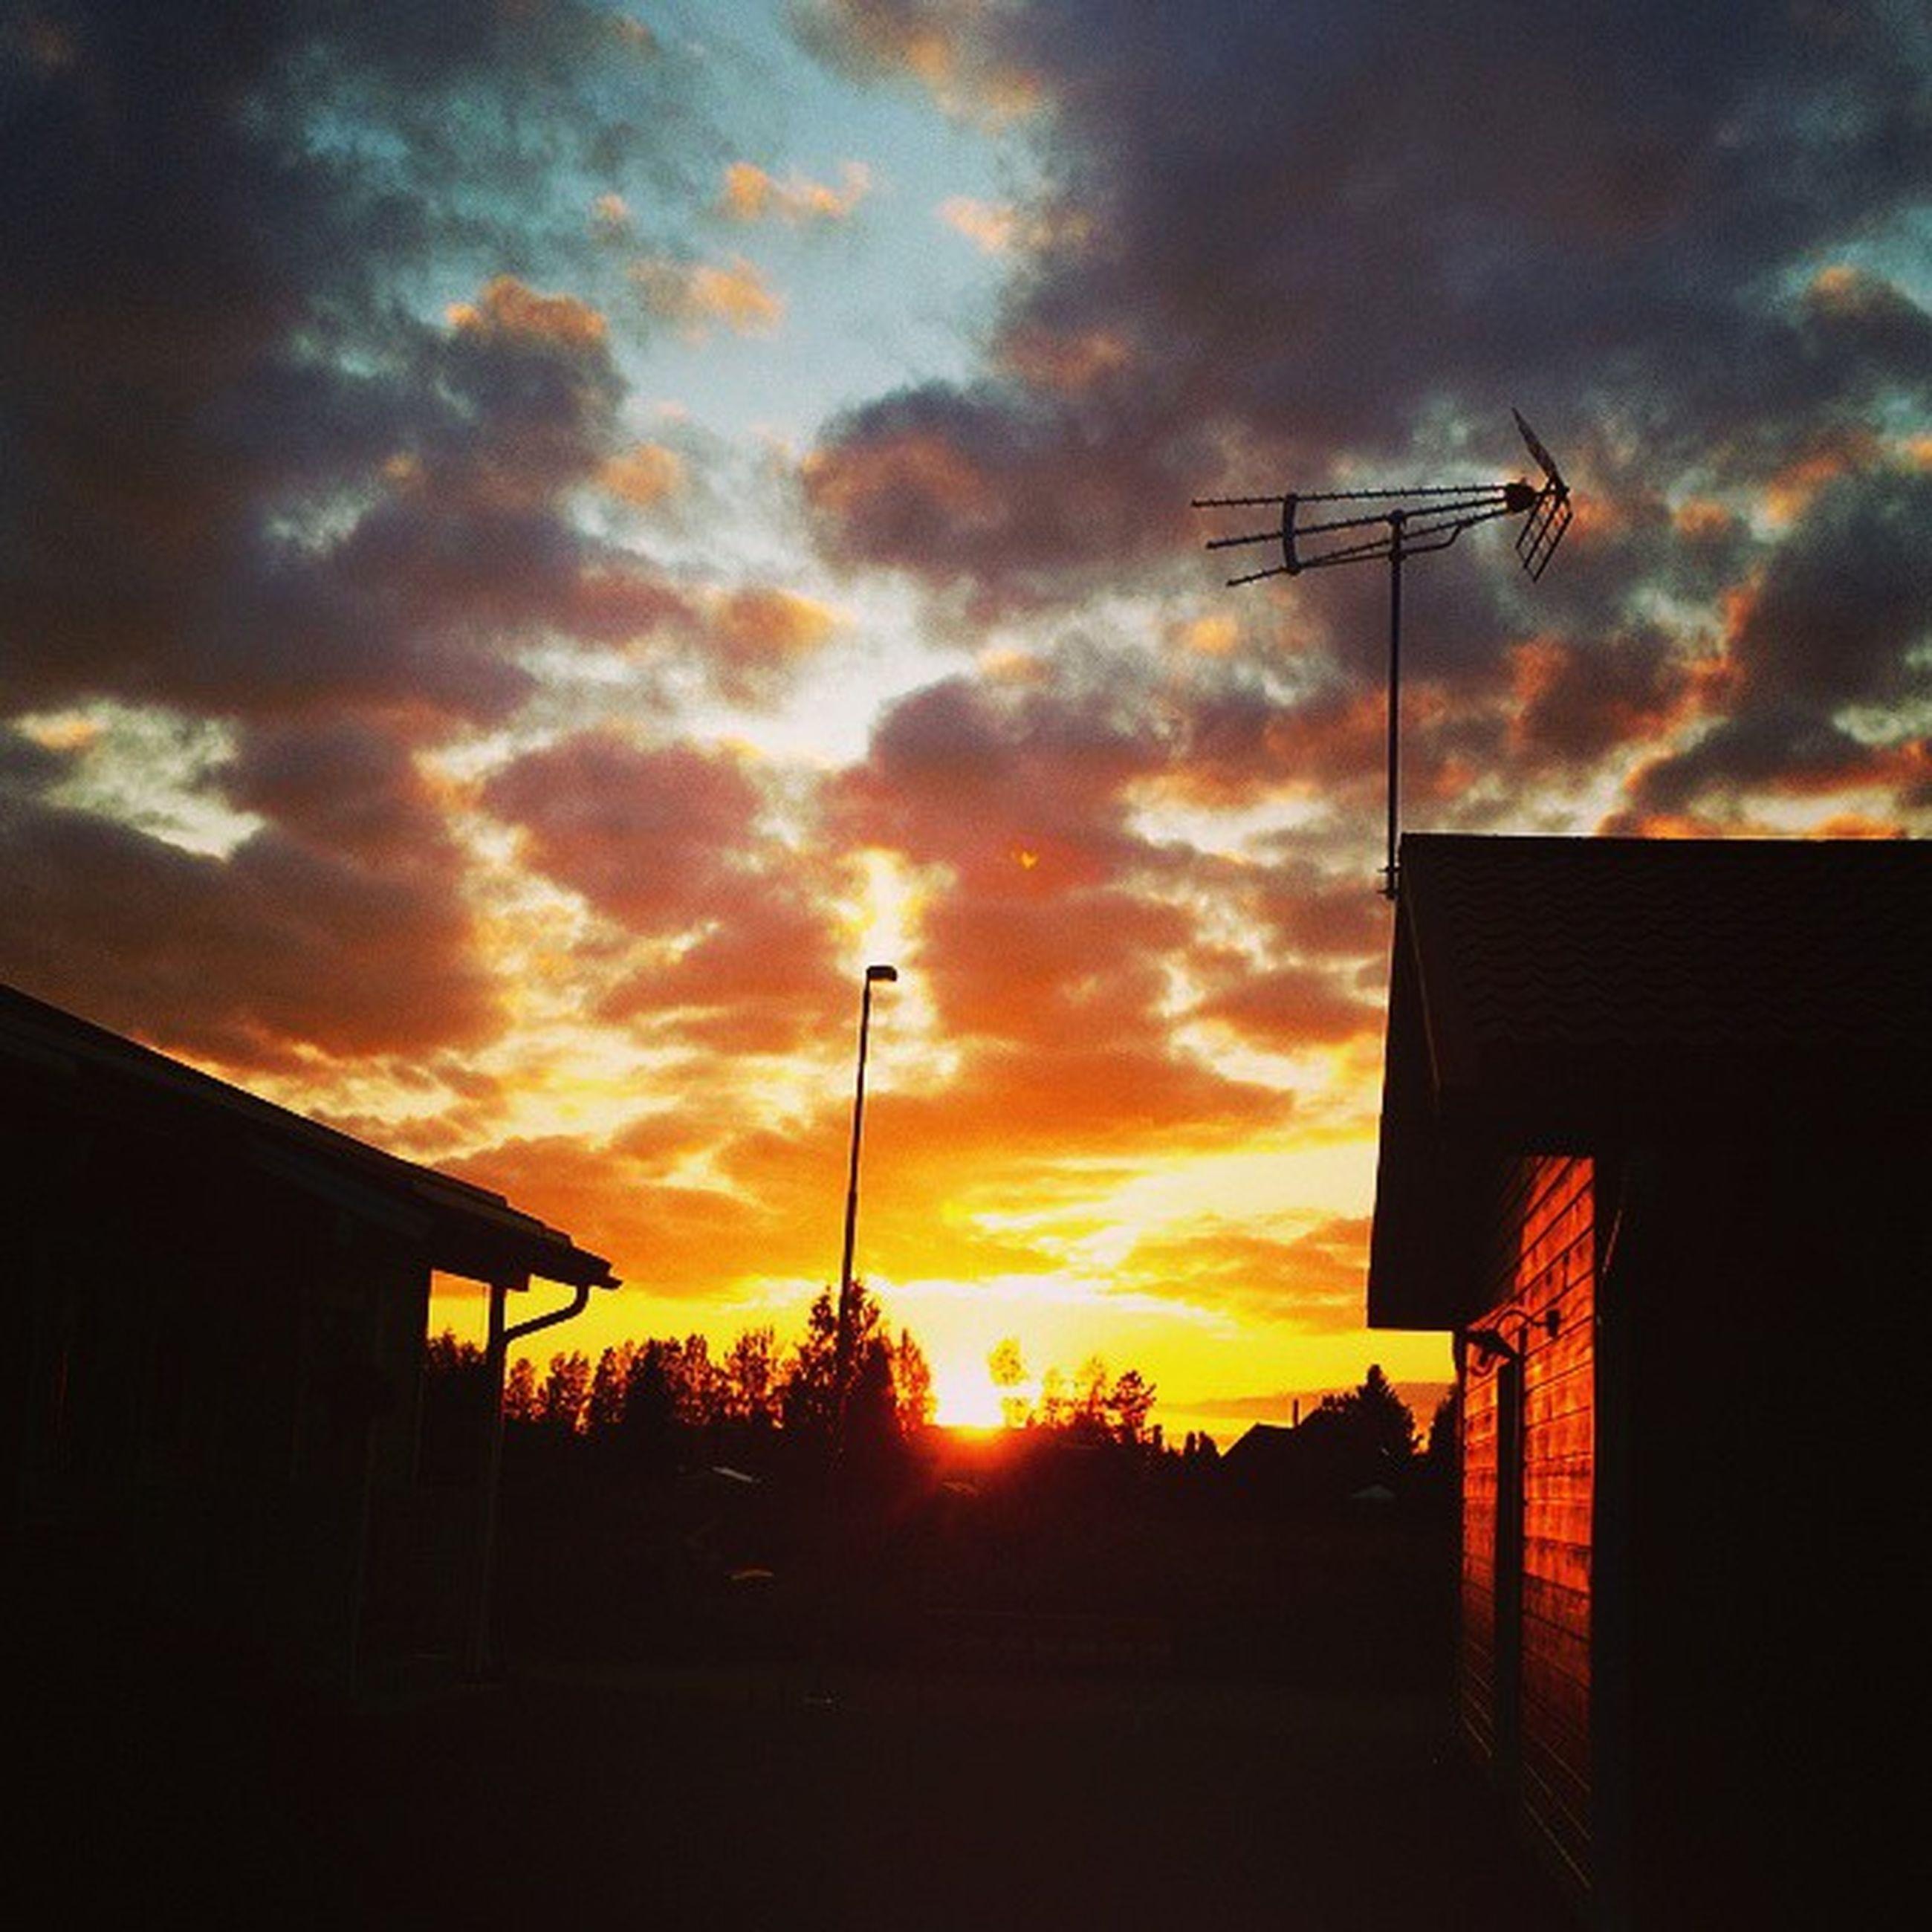 sunset, building exterior, architecture, built structure, sky, silhouette, orange color, cloud - sky, house, residential structure, residential building, street light, cloud, building, cloudy, city, sun, low angle view, outdoors, sunlight